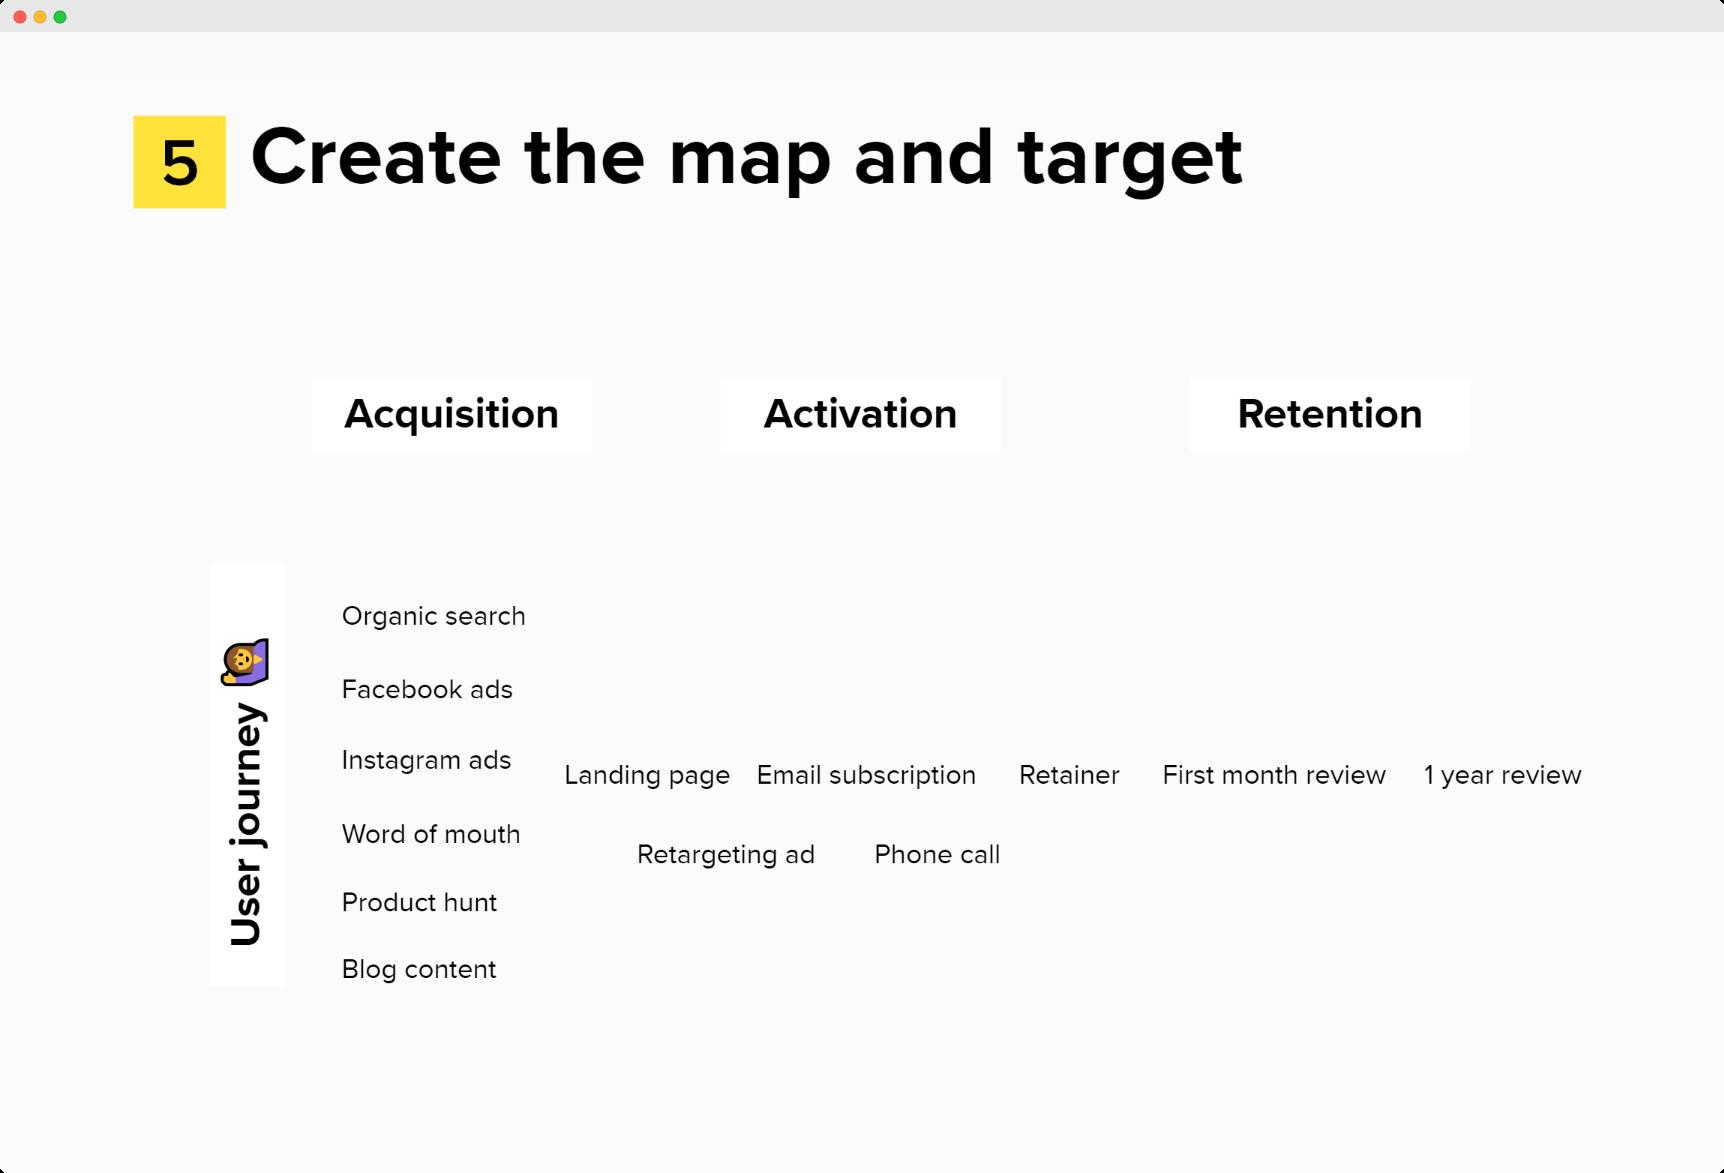 A screenshot of the growth marketing jam